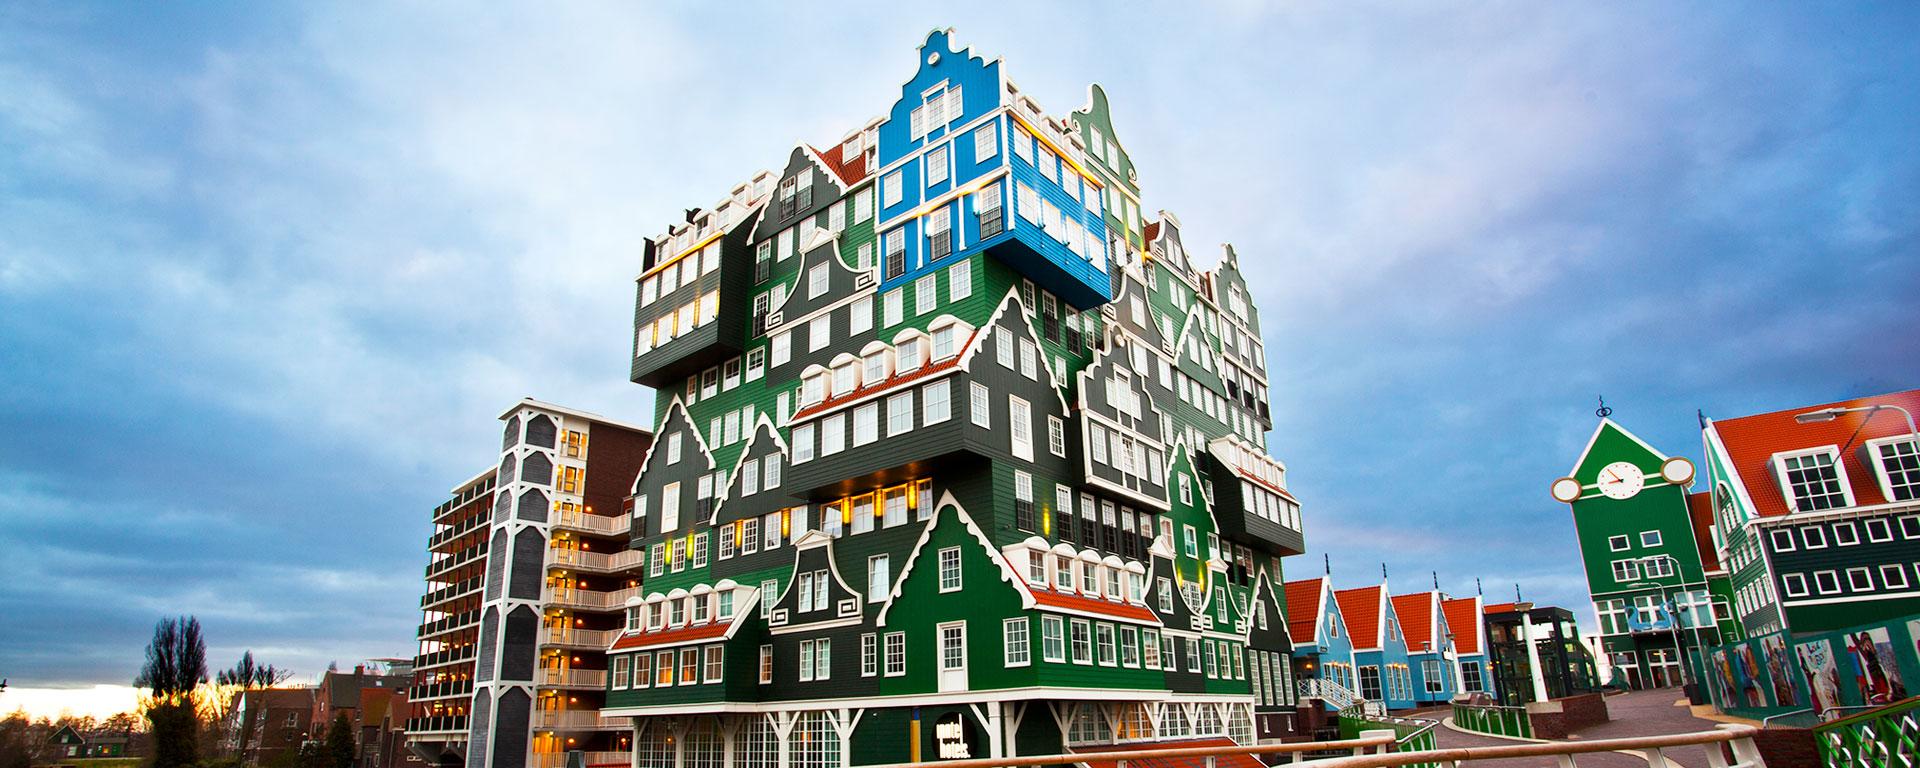 Hotel amsterdam zaandam interveste infonet for Amsterdam hotel